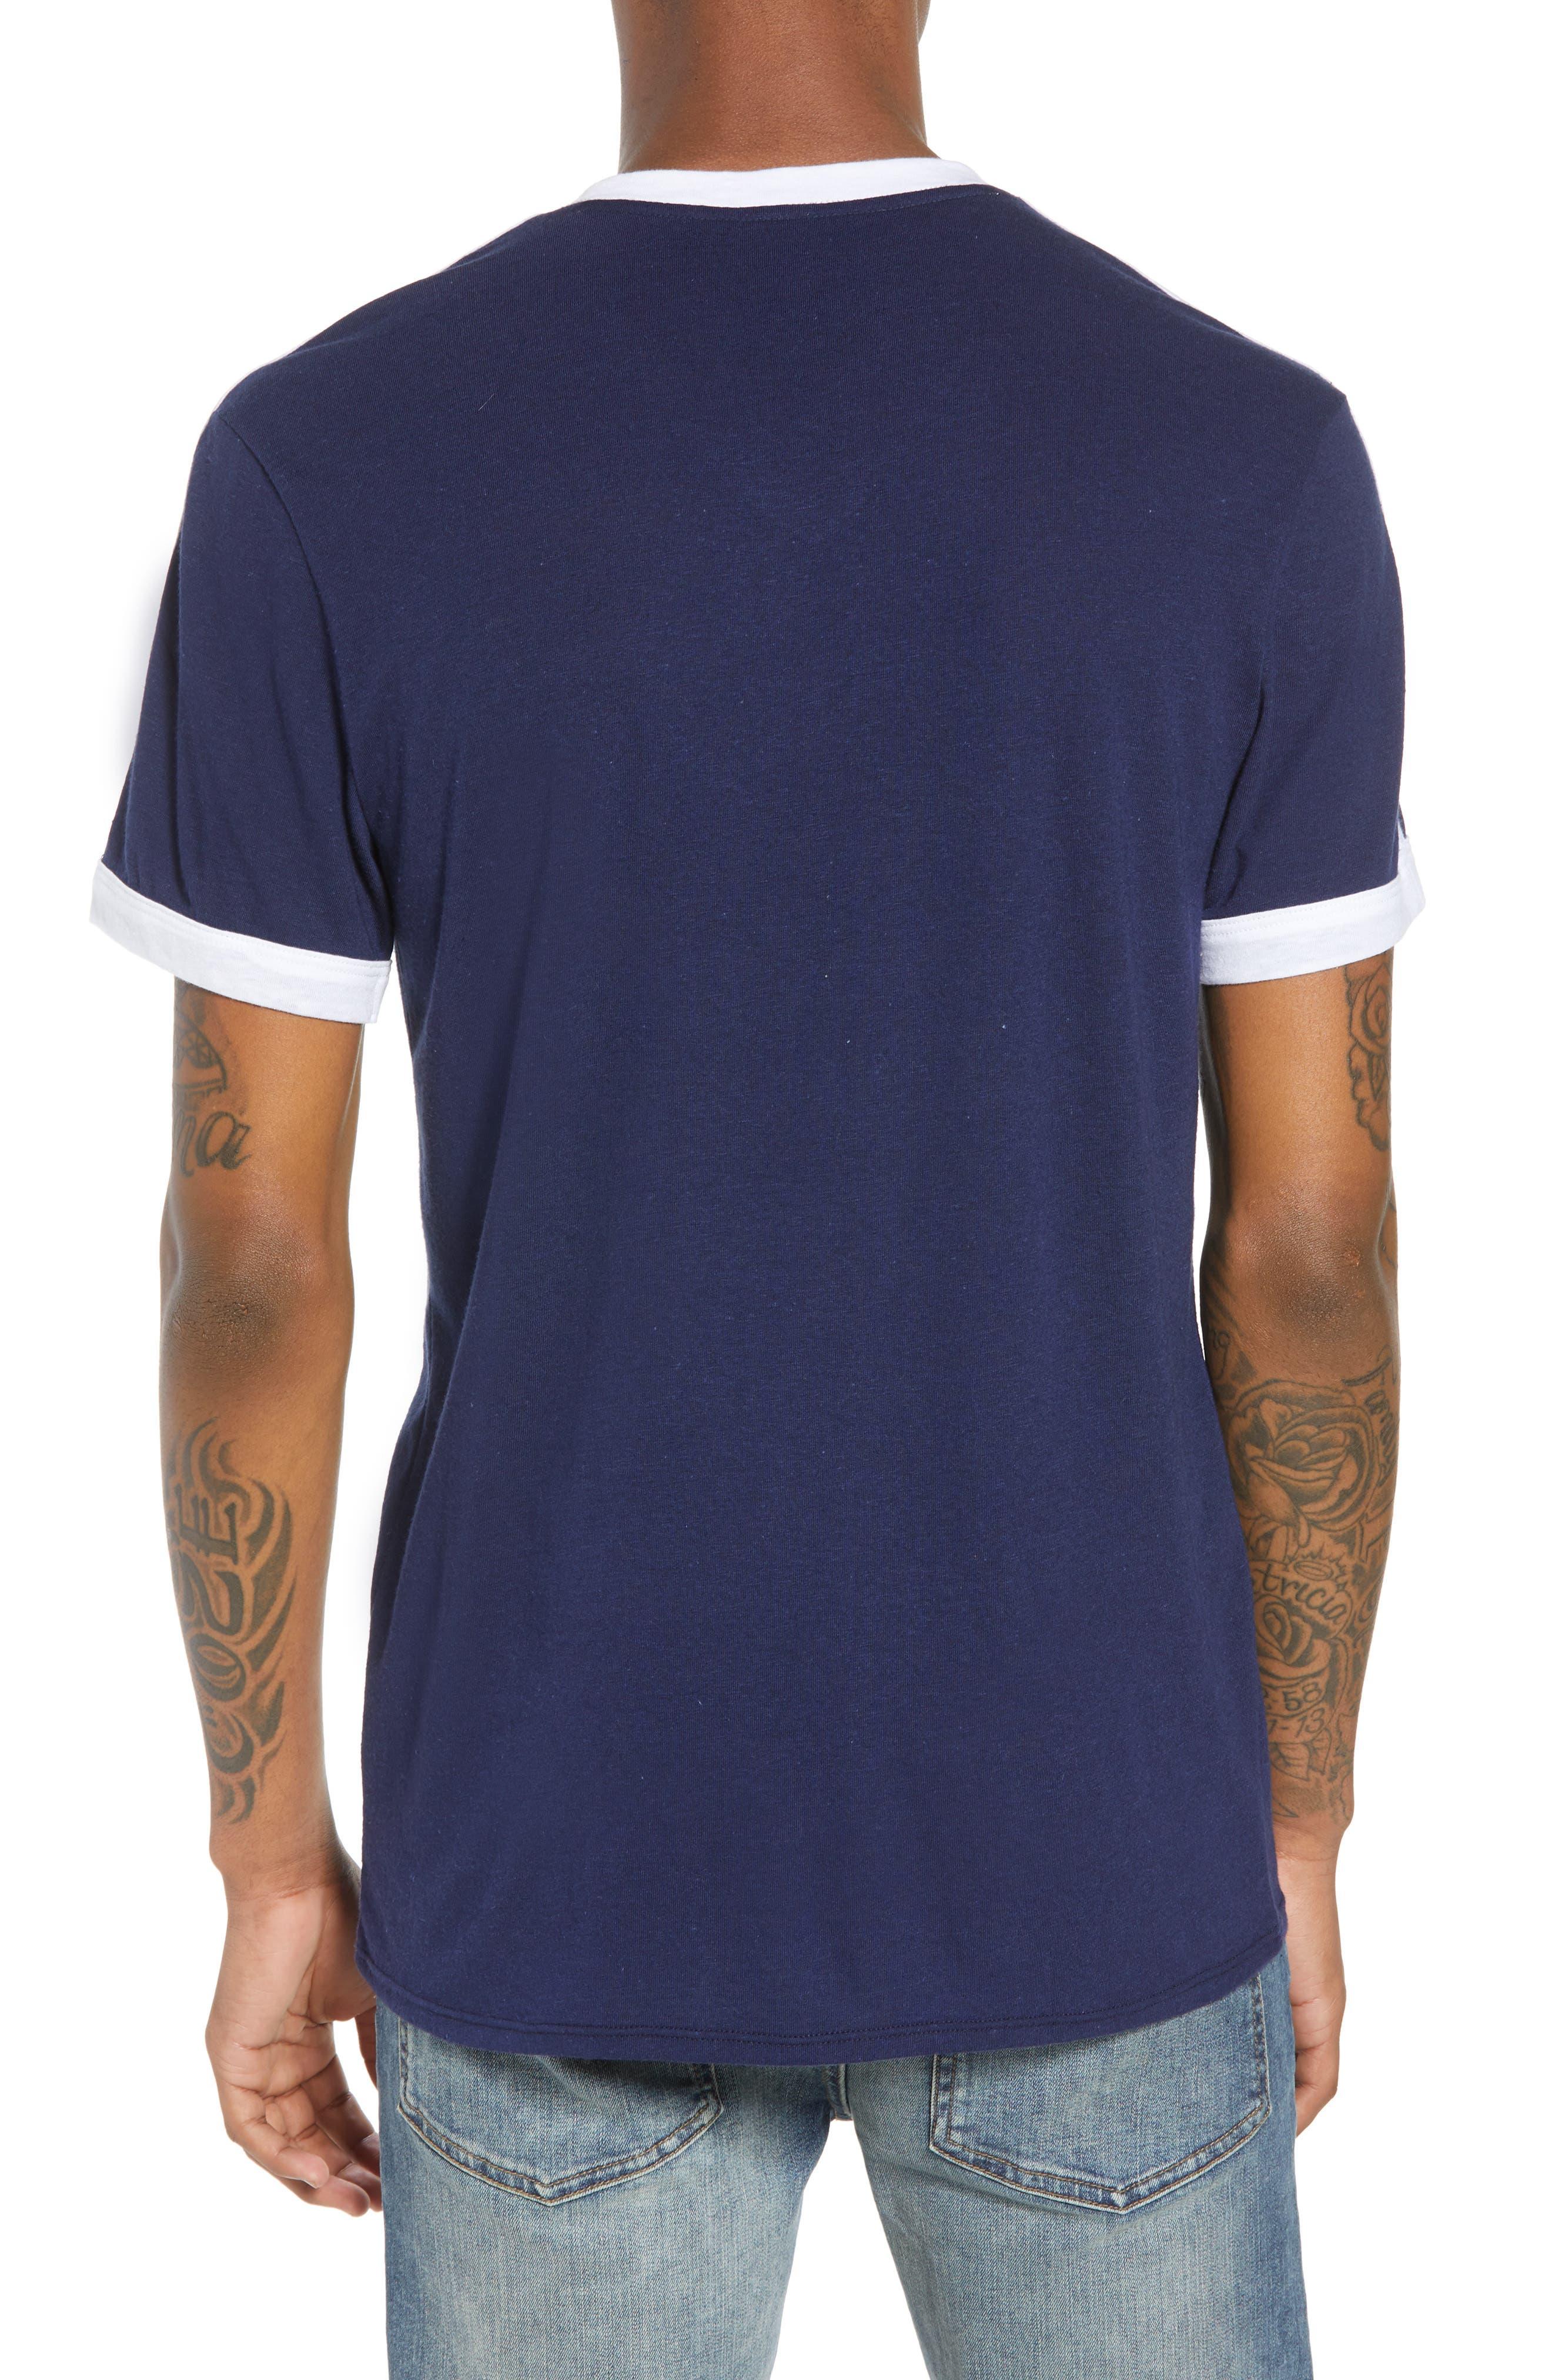 Vintage Athletic V-Neck T-Shirt,                             Alternate thumbnail 2, color,                             410